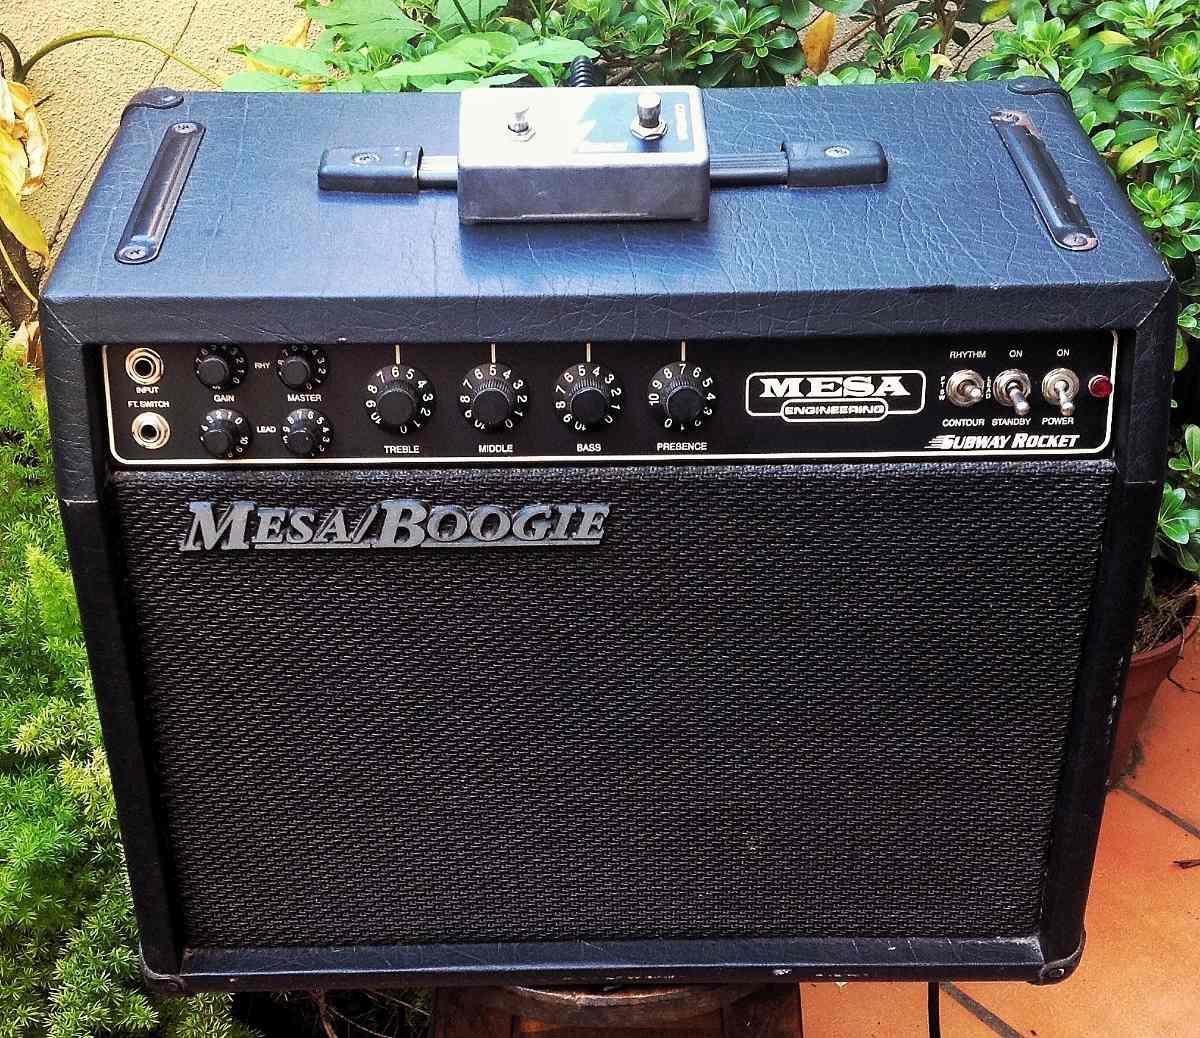 Mesa Boogie Subway Rocket   5800000 en Mercado Libre